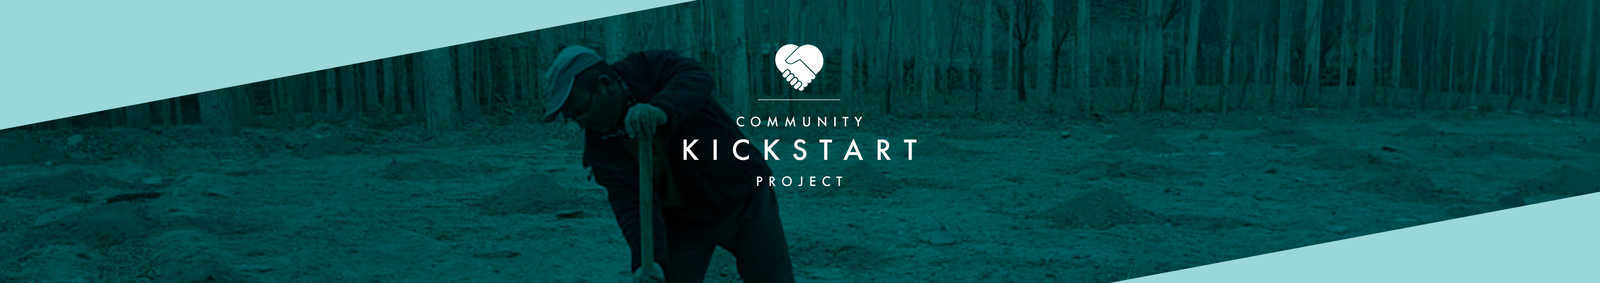 Community Kickstart Project